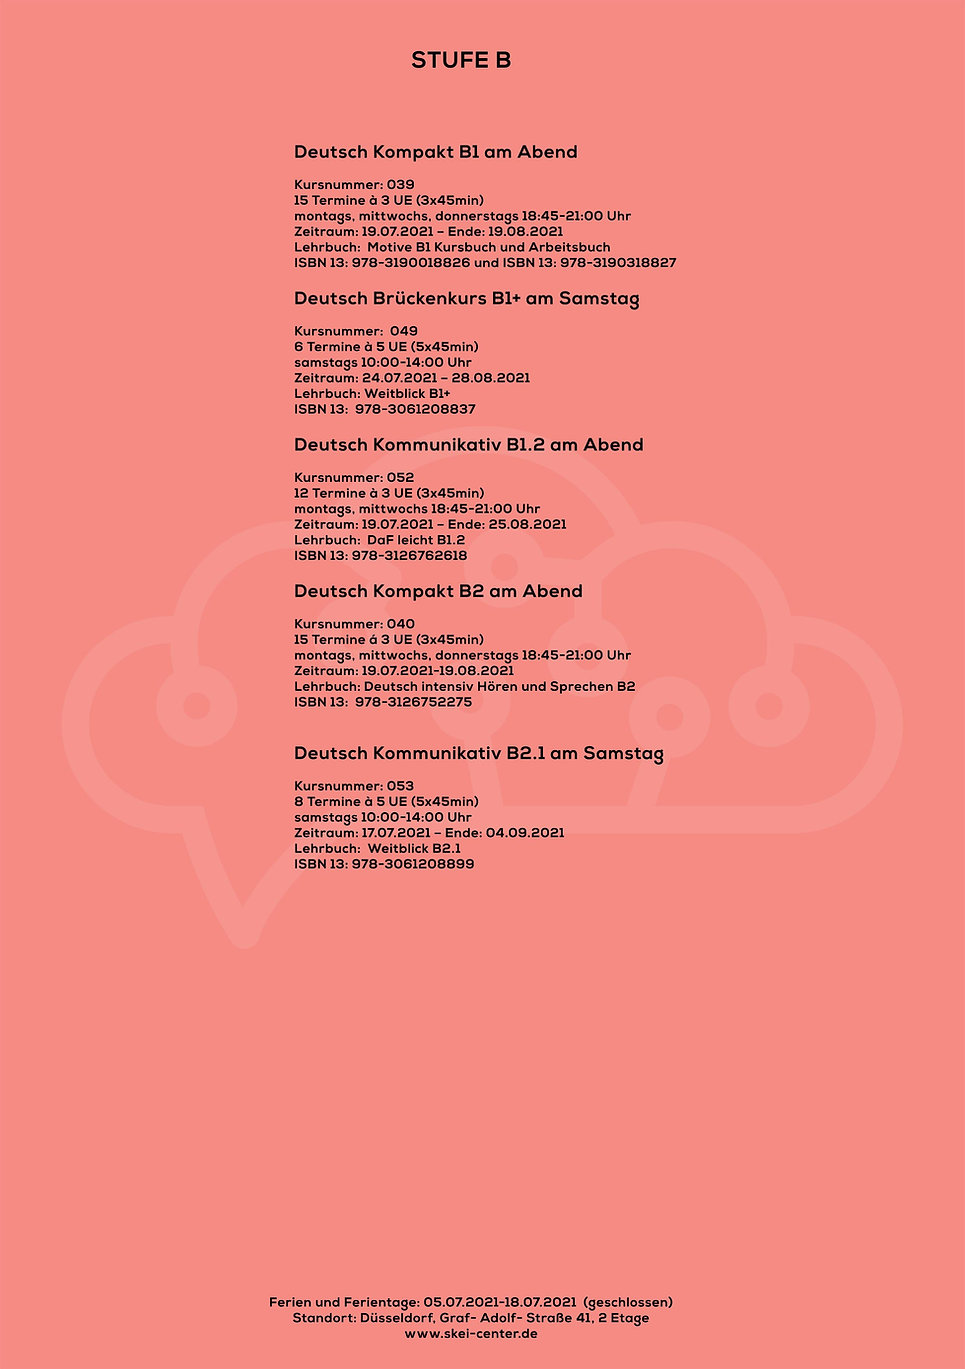 Kursprogramm STUFE B_20072021 Kopie.jpg